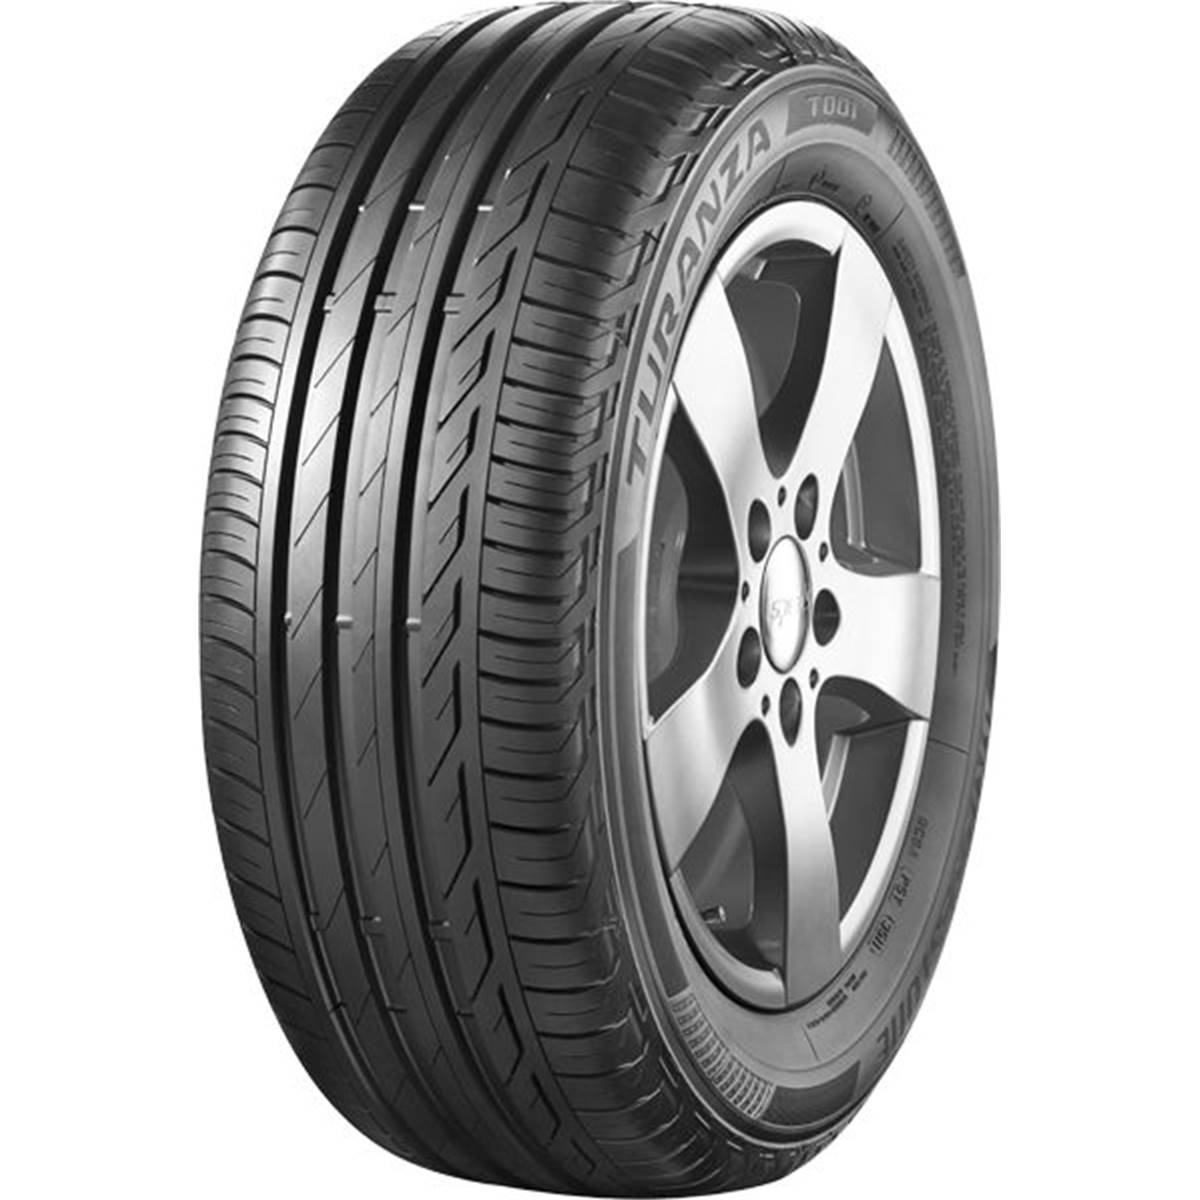 Pneu Bridgestone 215/55R16 93H Turanza T001